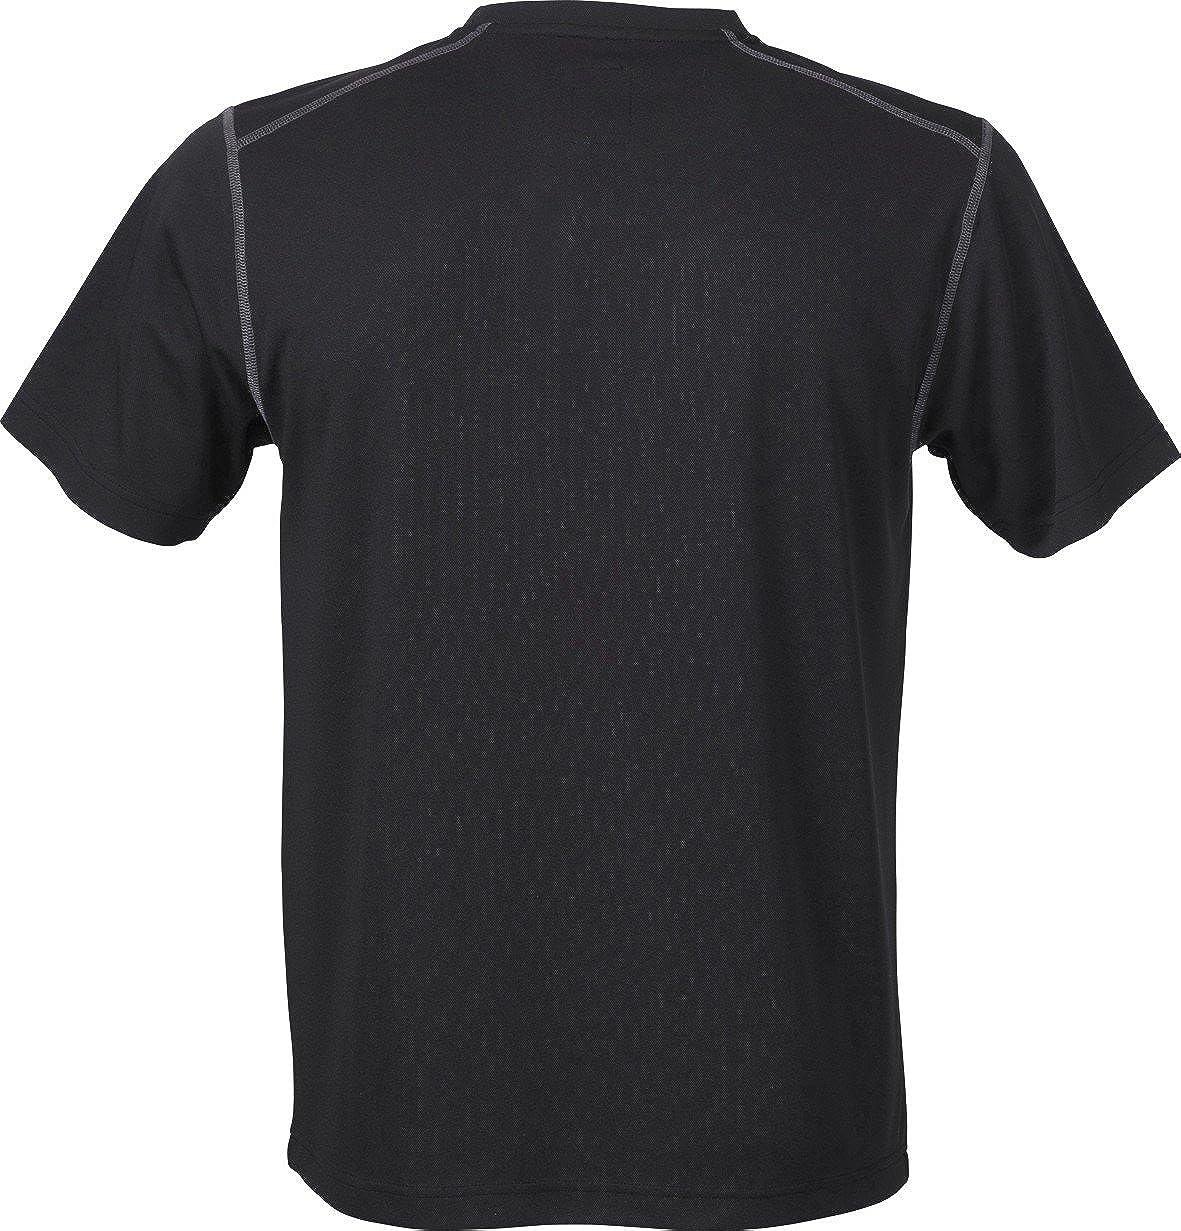 Fristads Kansas Workwear 100965 T-Shirt